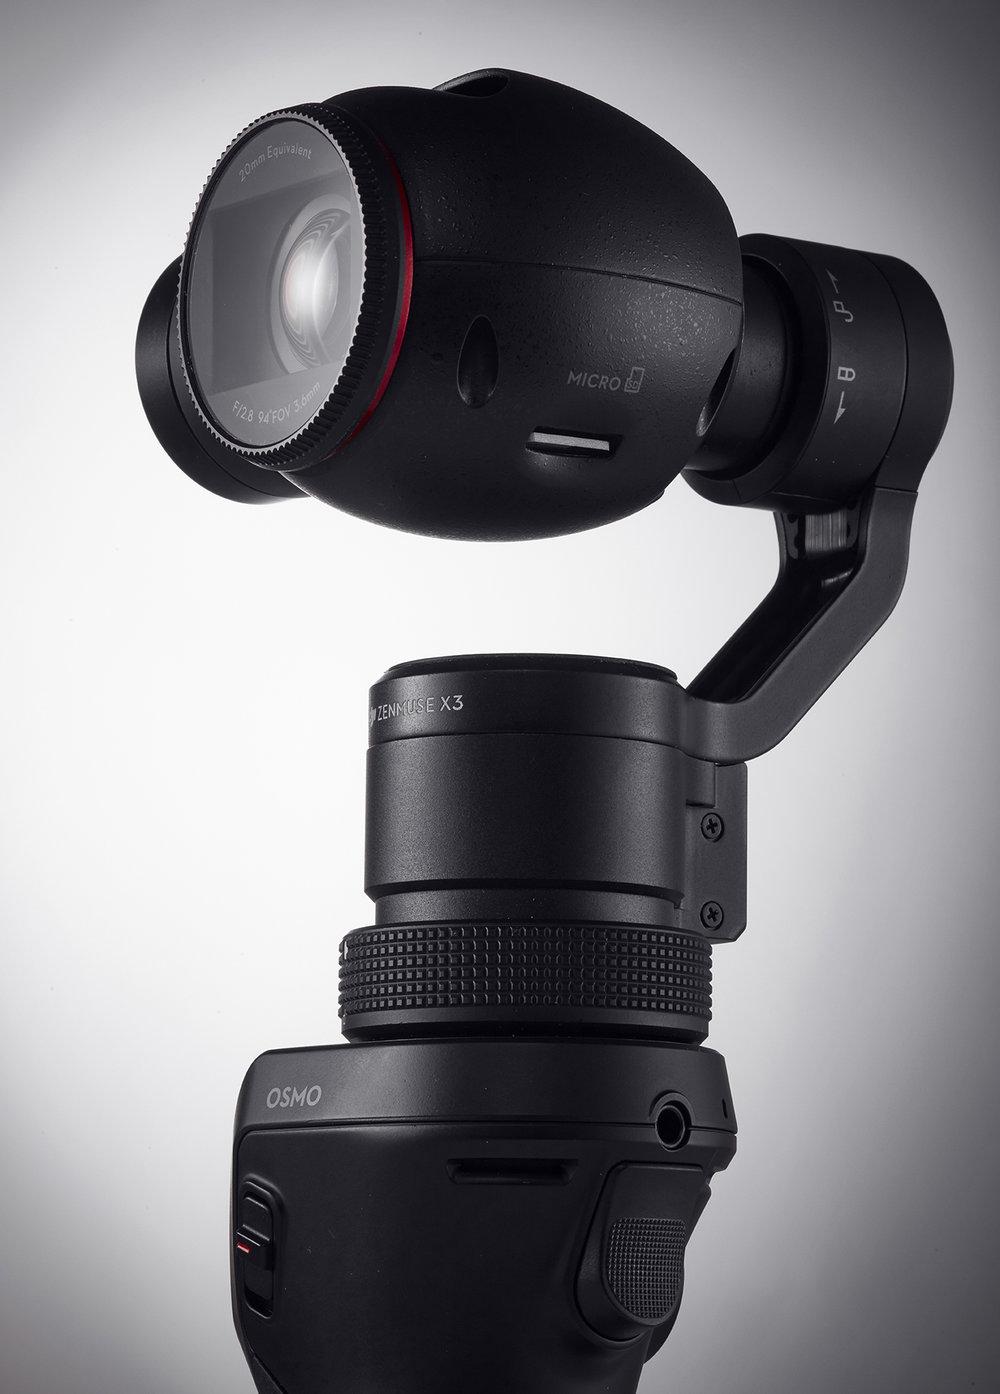 dji osmo lens creative product photography studio lighting professional creative product.jpg